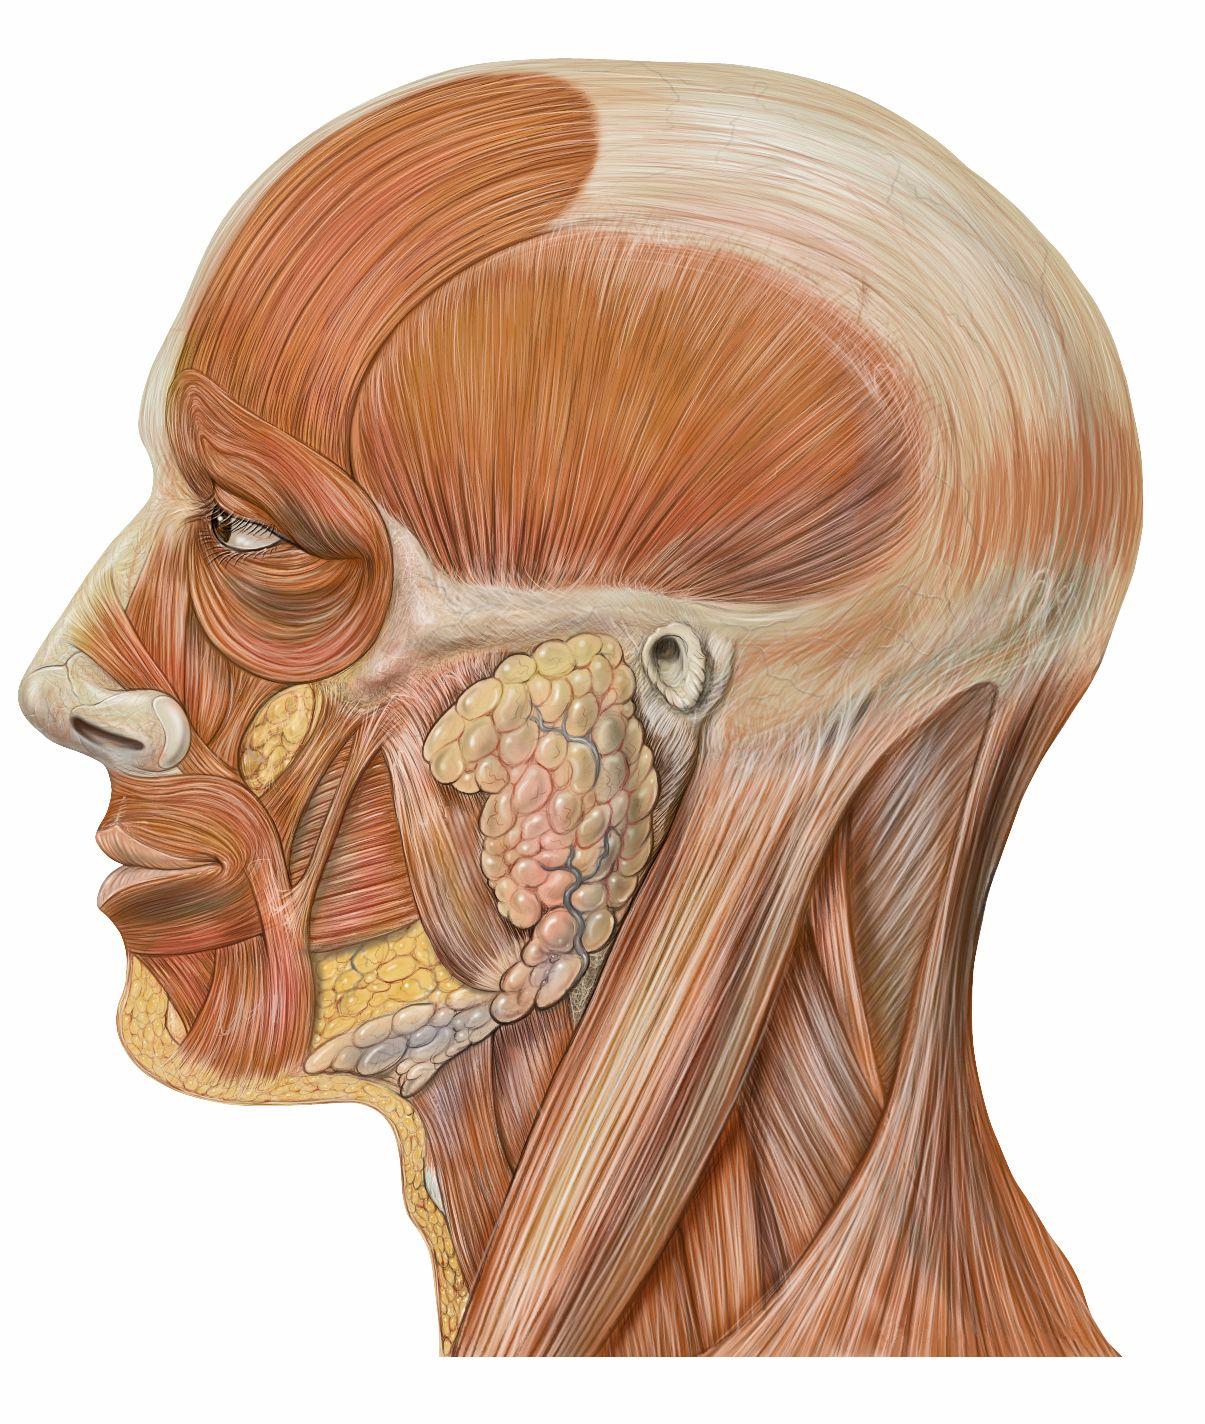 Pin By Daniel Banasik On Anatomy In 2018 Pinterest Muscle Face